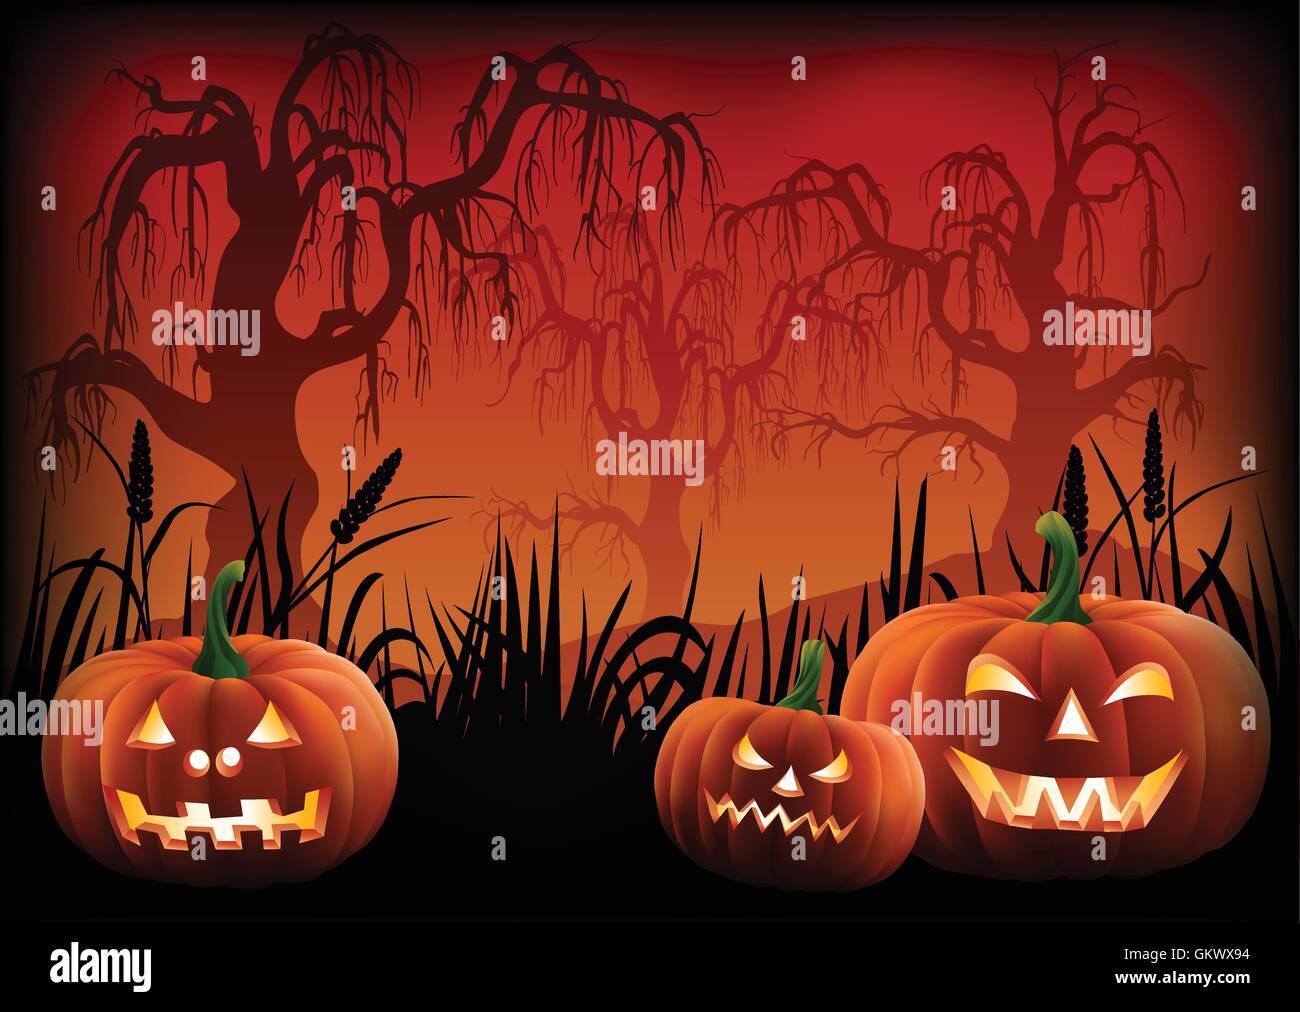 Immagine Zucca Di Halloween 94.Le Zucche Scolpite A Pie Di Pagina Di Un Sfondo Di Halloween